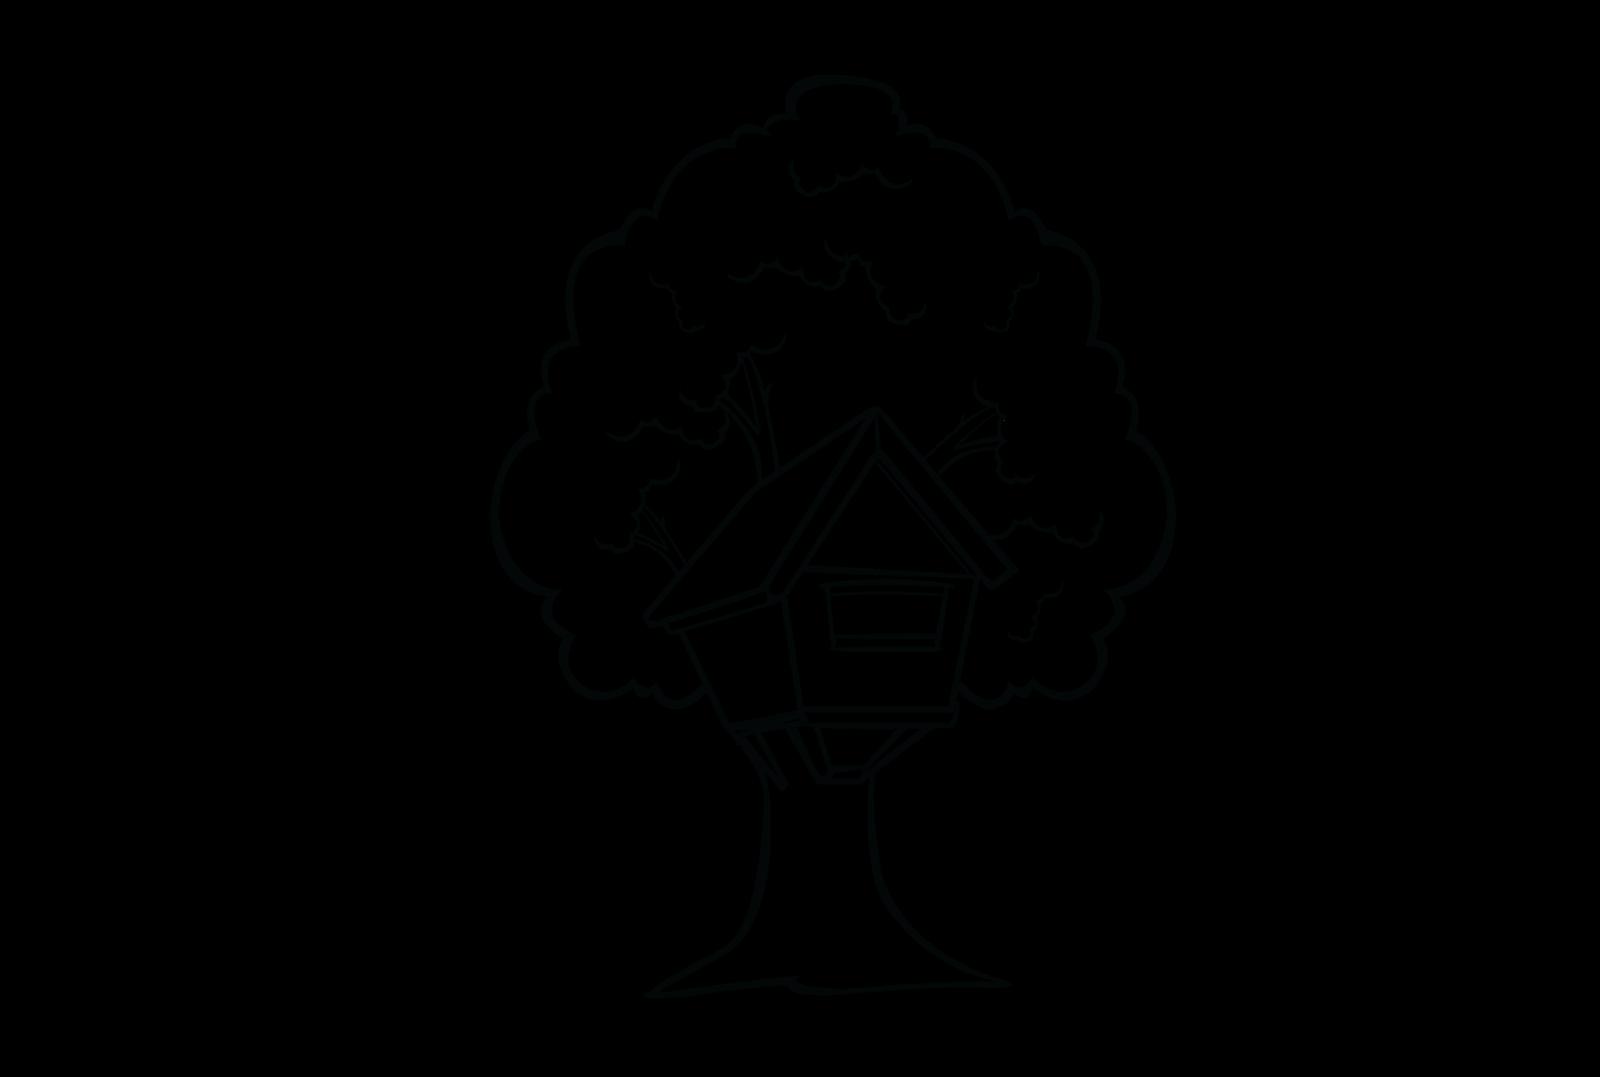 Clipart tree house black and white banner transparent stock Fiverrtastic: Illustrators on Fiverr banner transparent stock